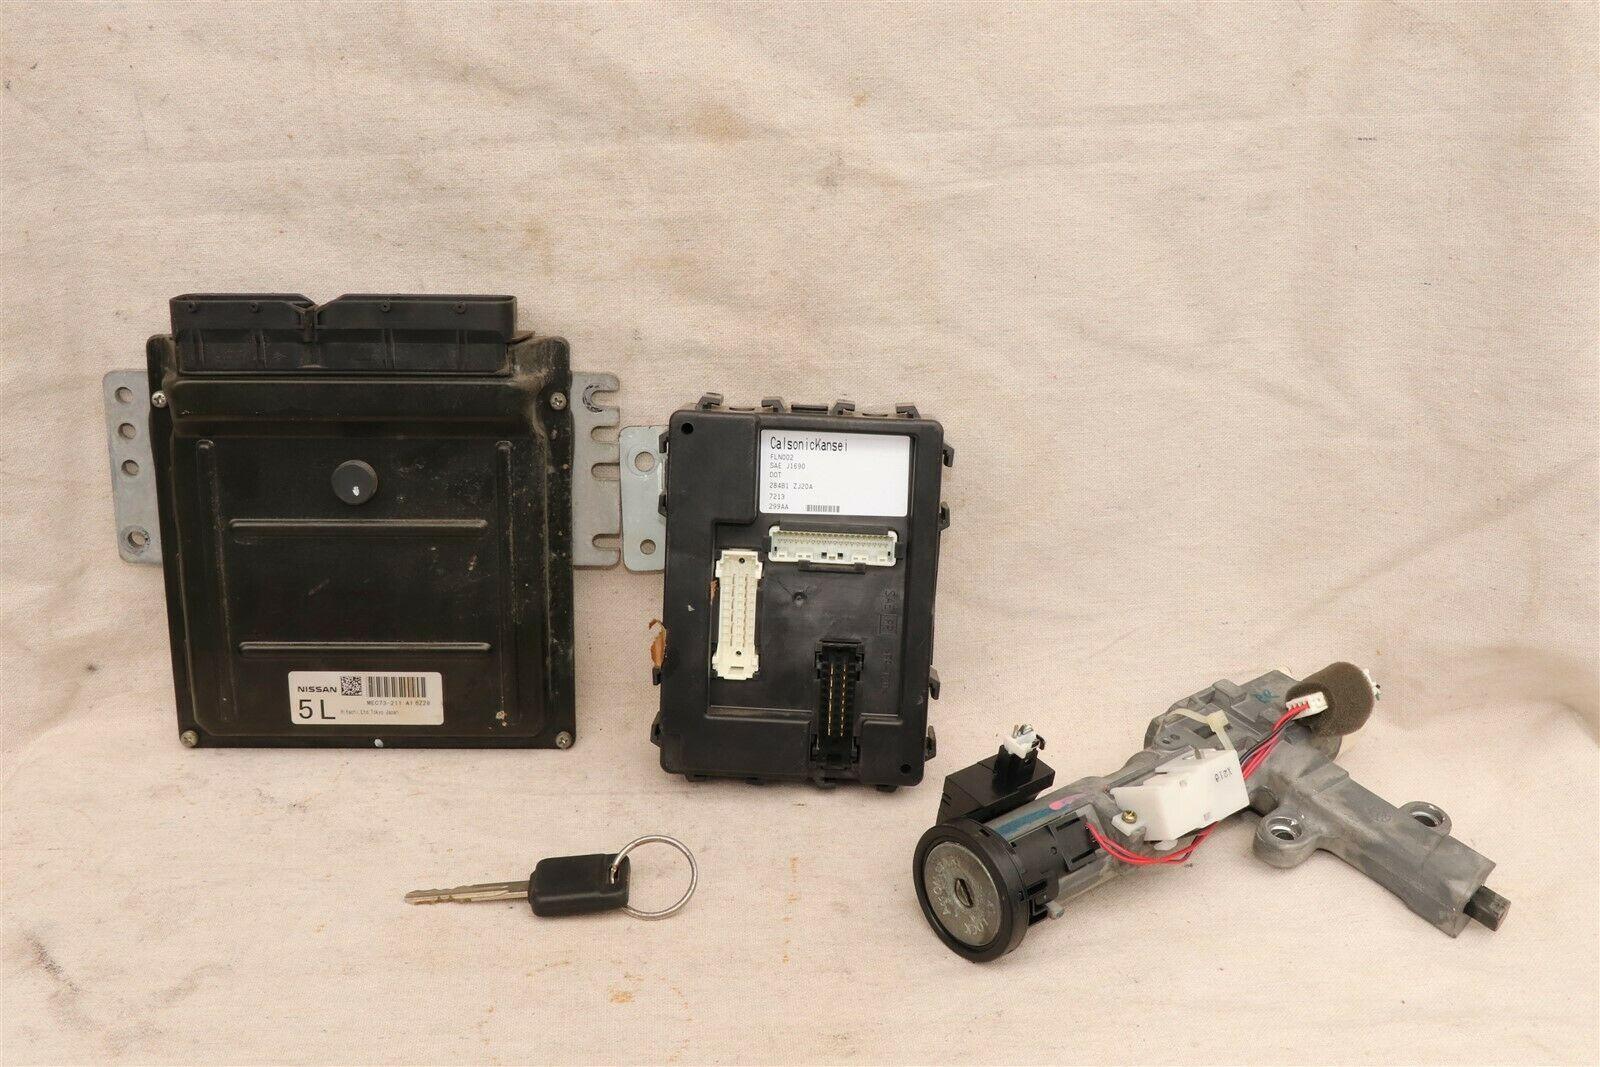 2007 Nissan Titan 4x2 ECU ECM Computer BCM Ignition Switch W/ Key MEC74-531-A1